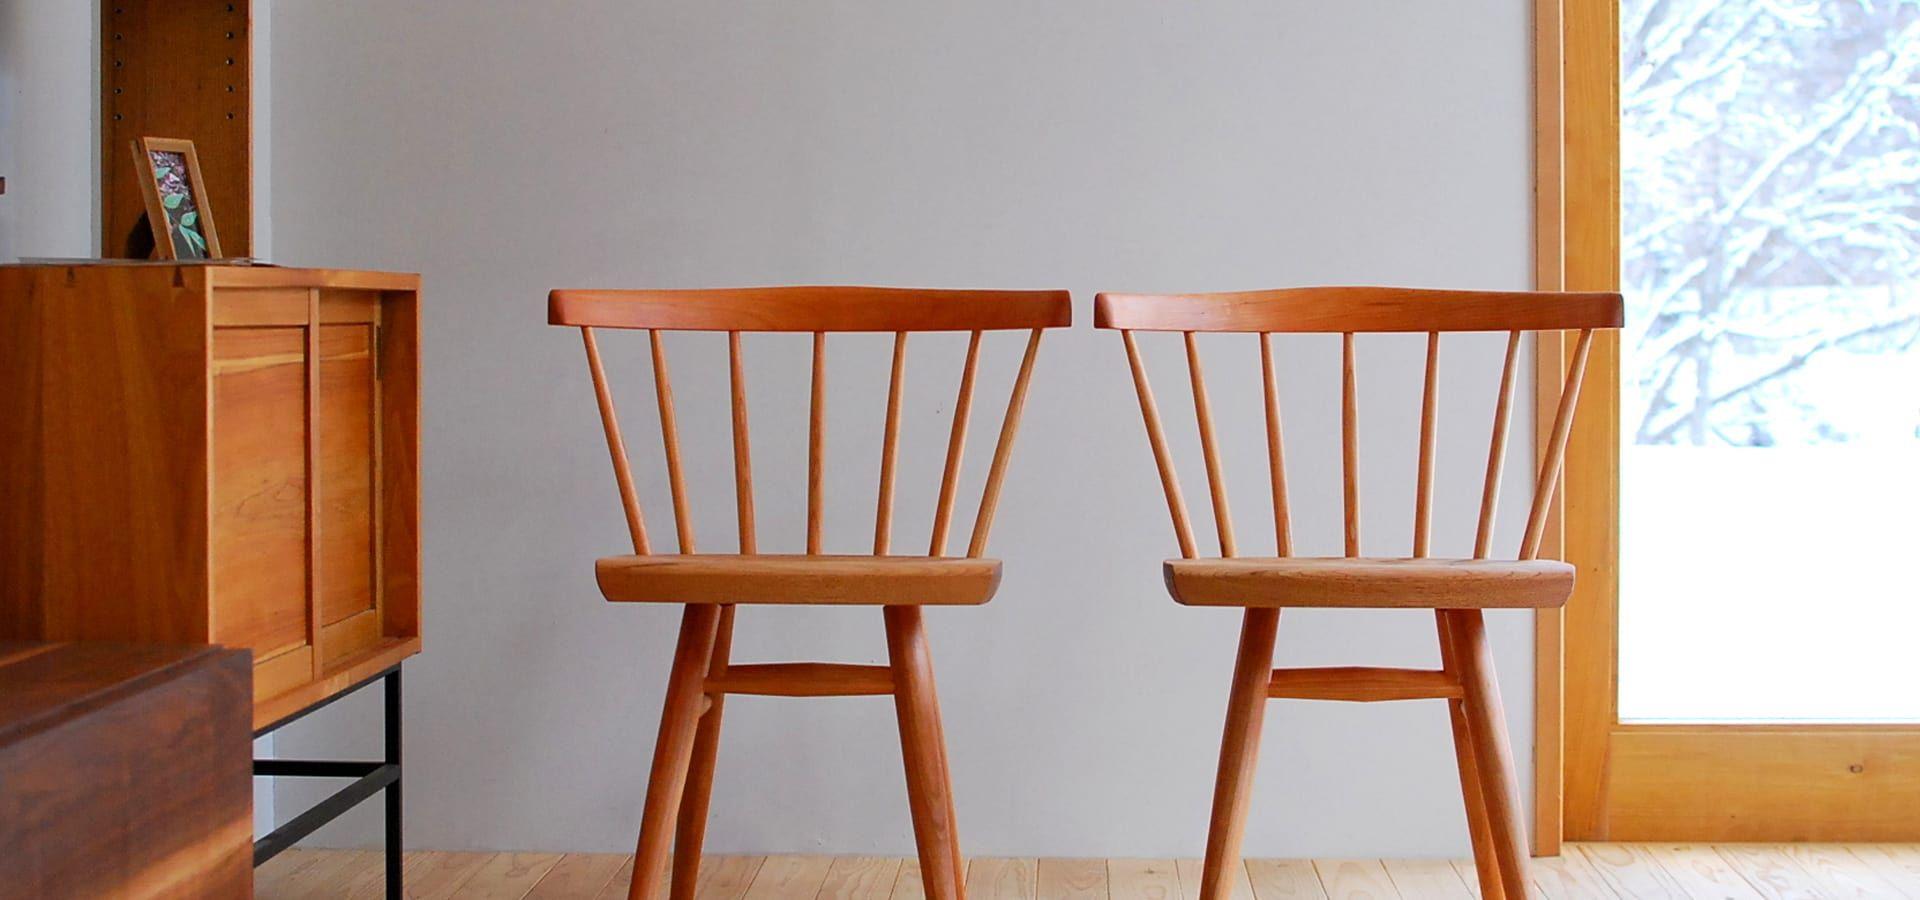 ishitani furniture | Furniture | Furniture, Chair bench ...